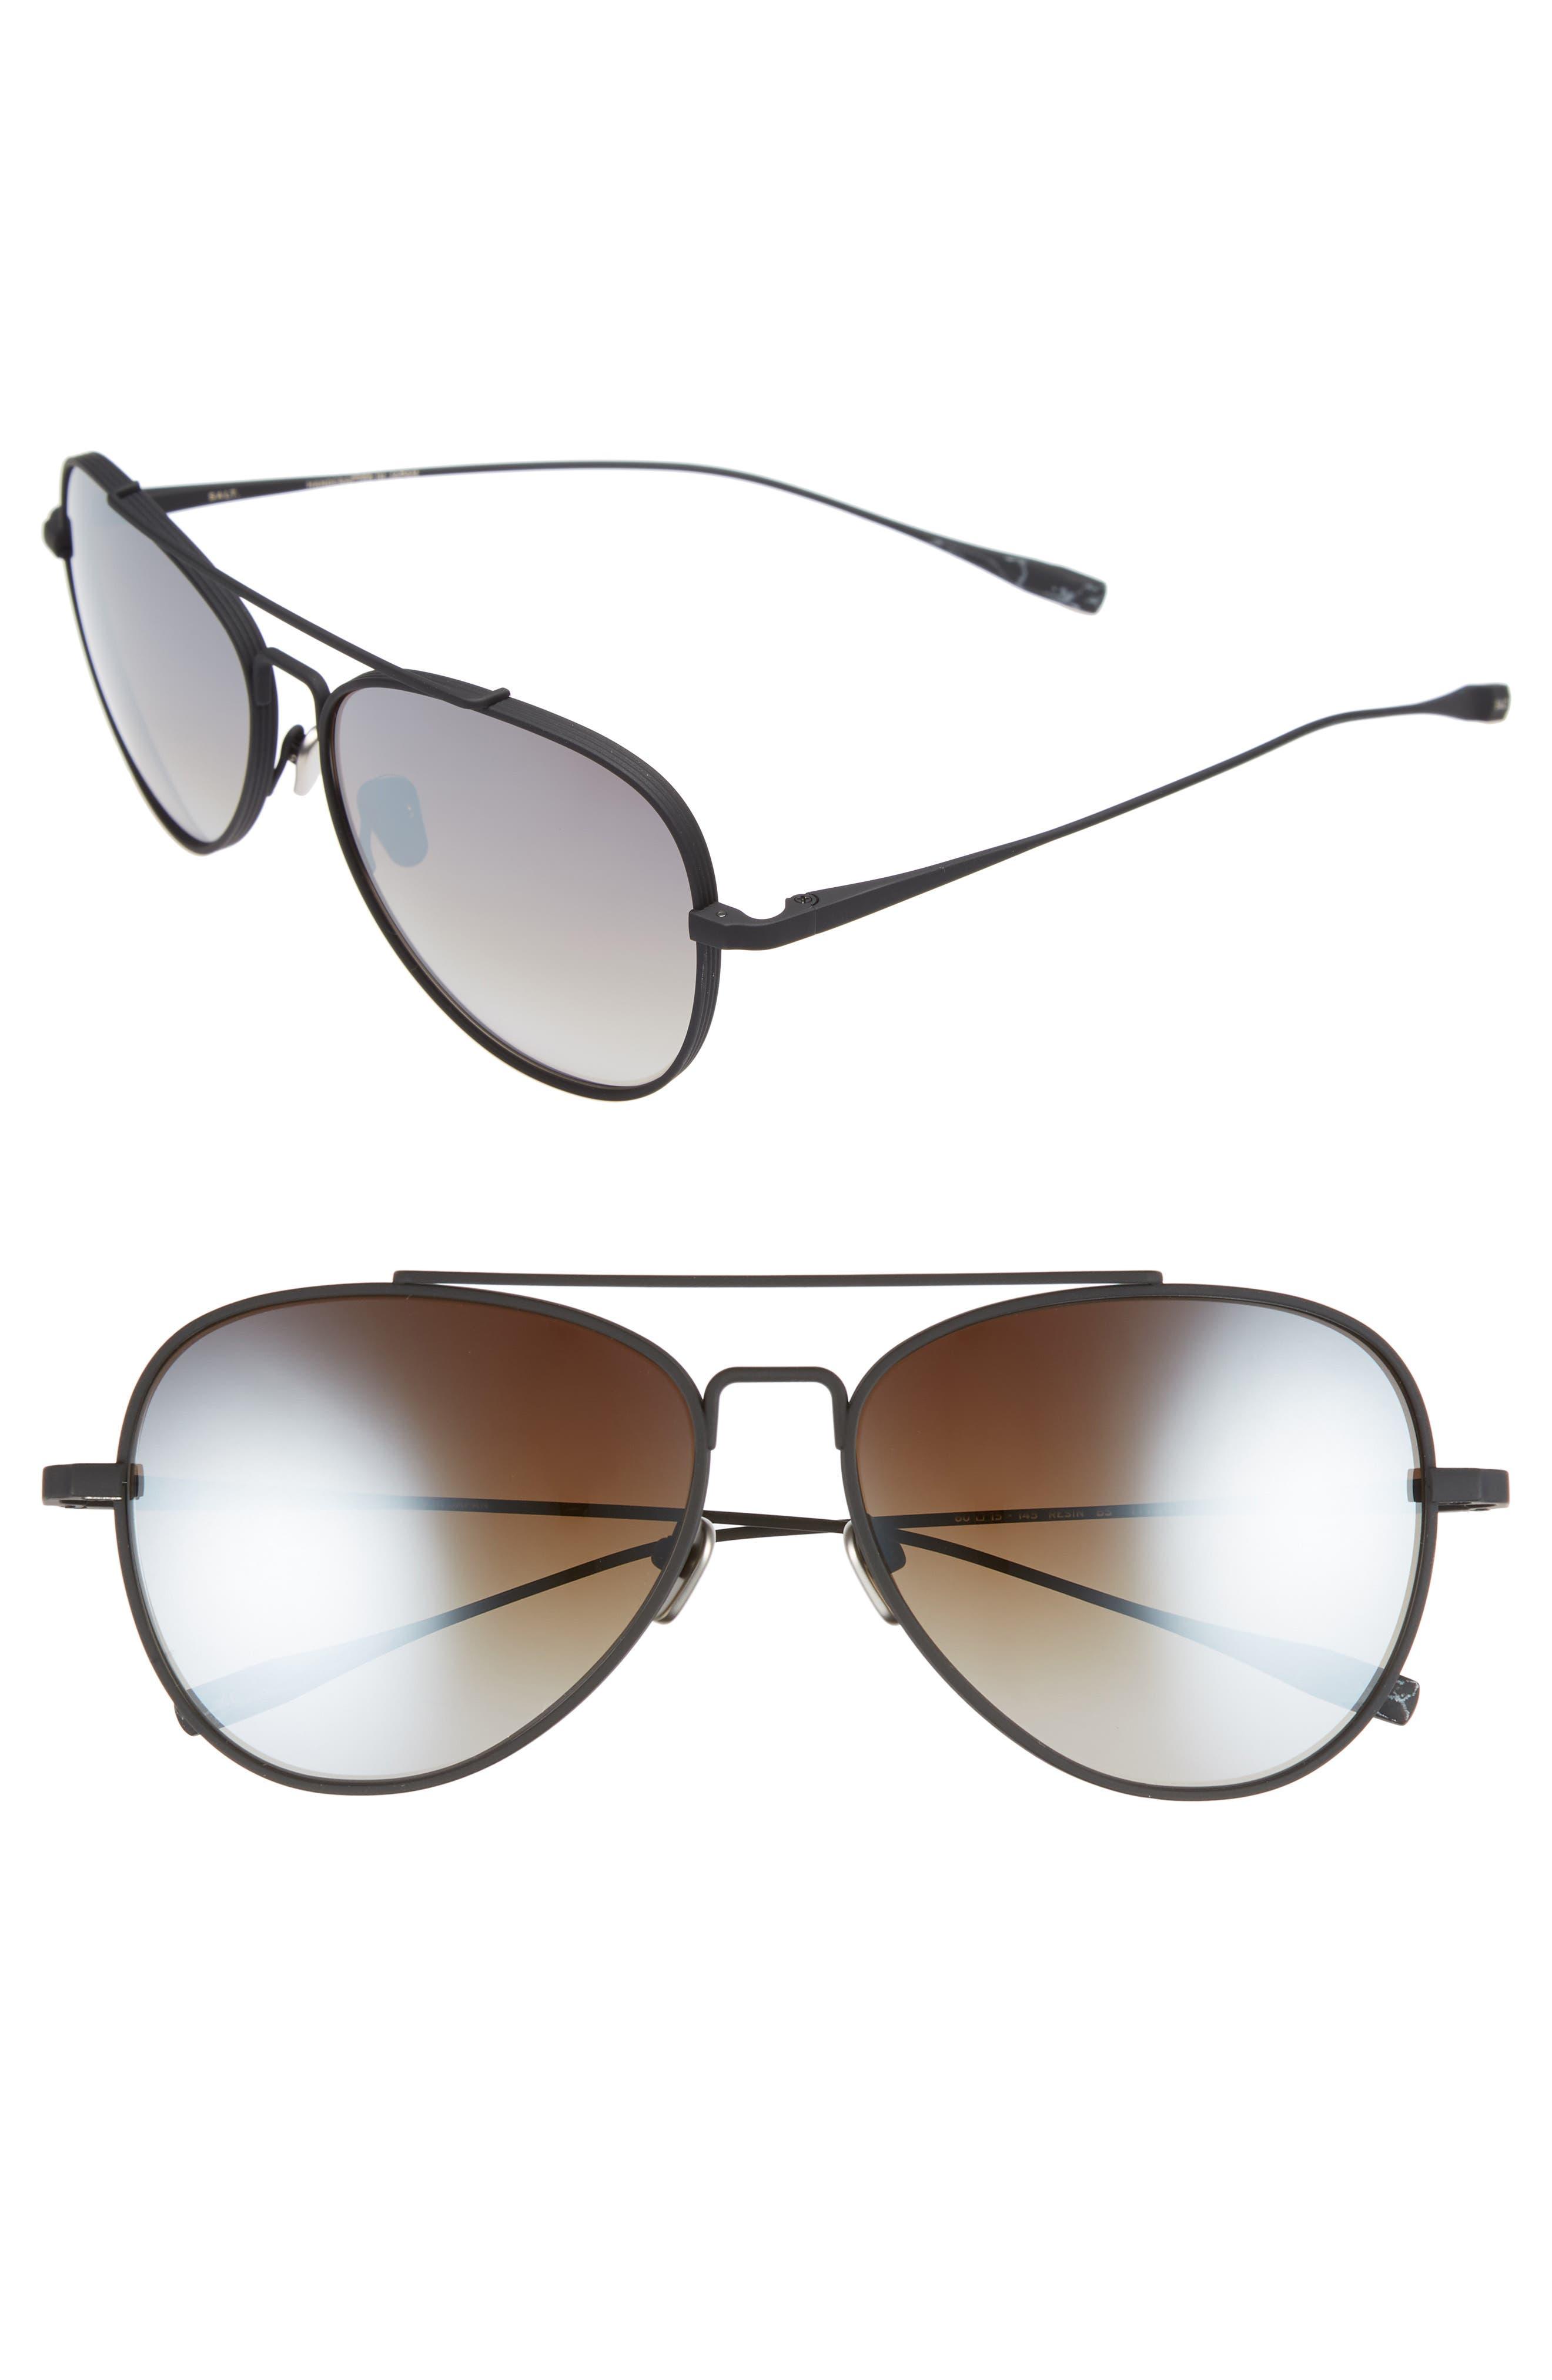 60mm Polarized Aviator Sunglasses,                         Main,                         color, BLACK